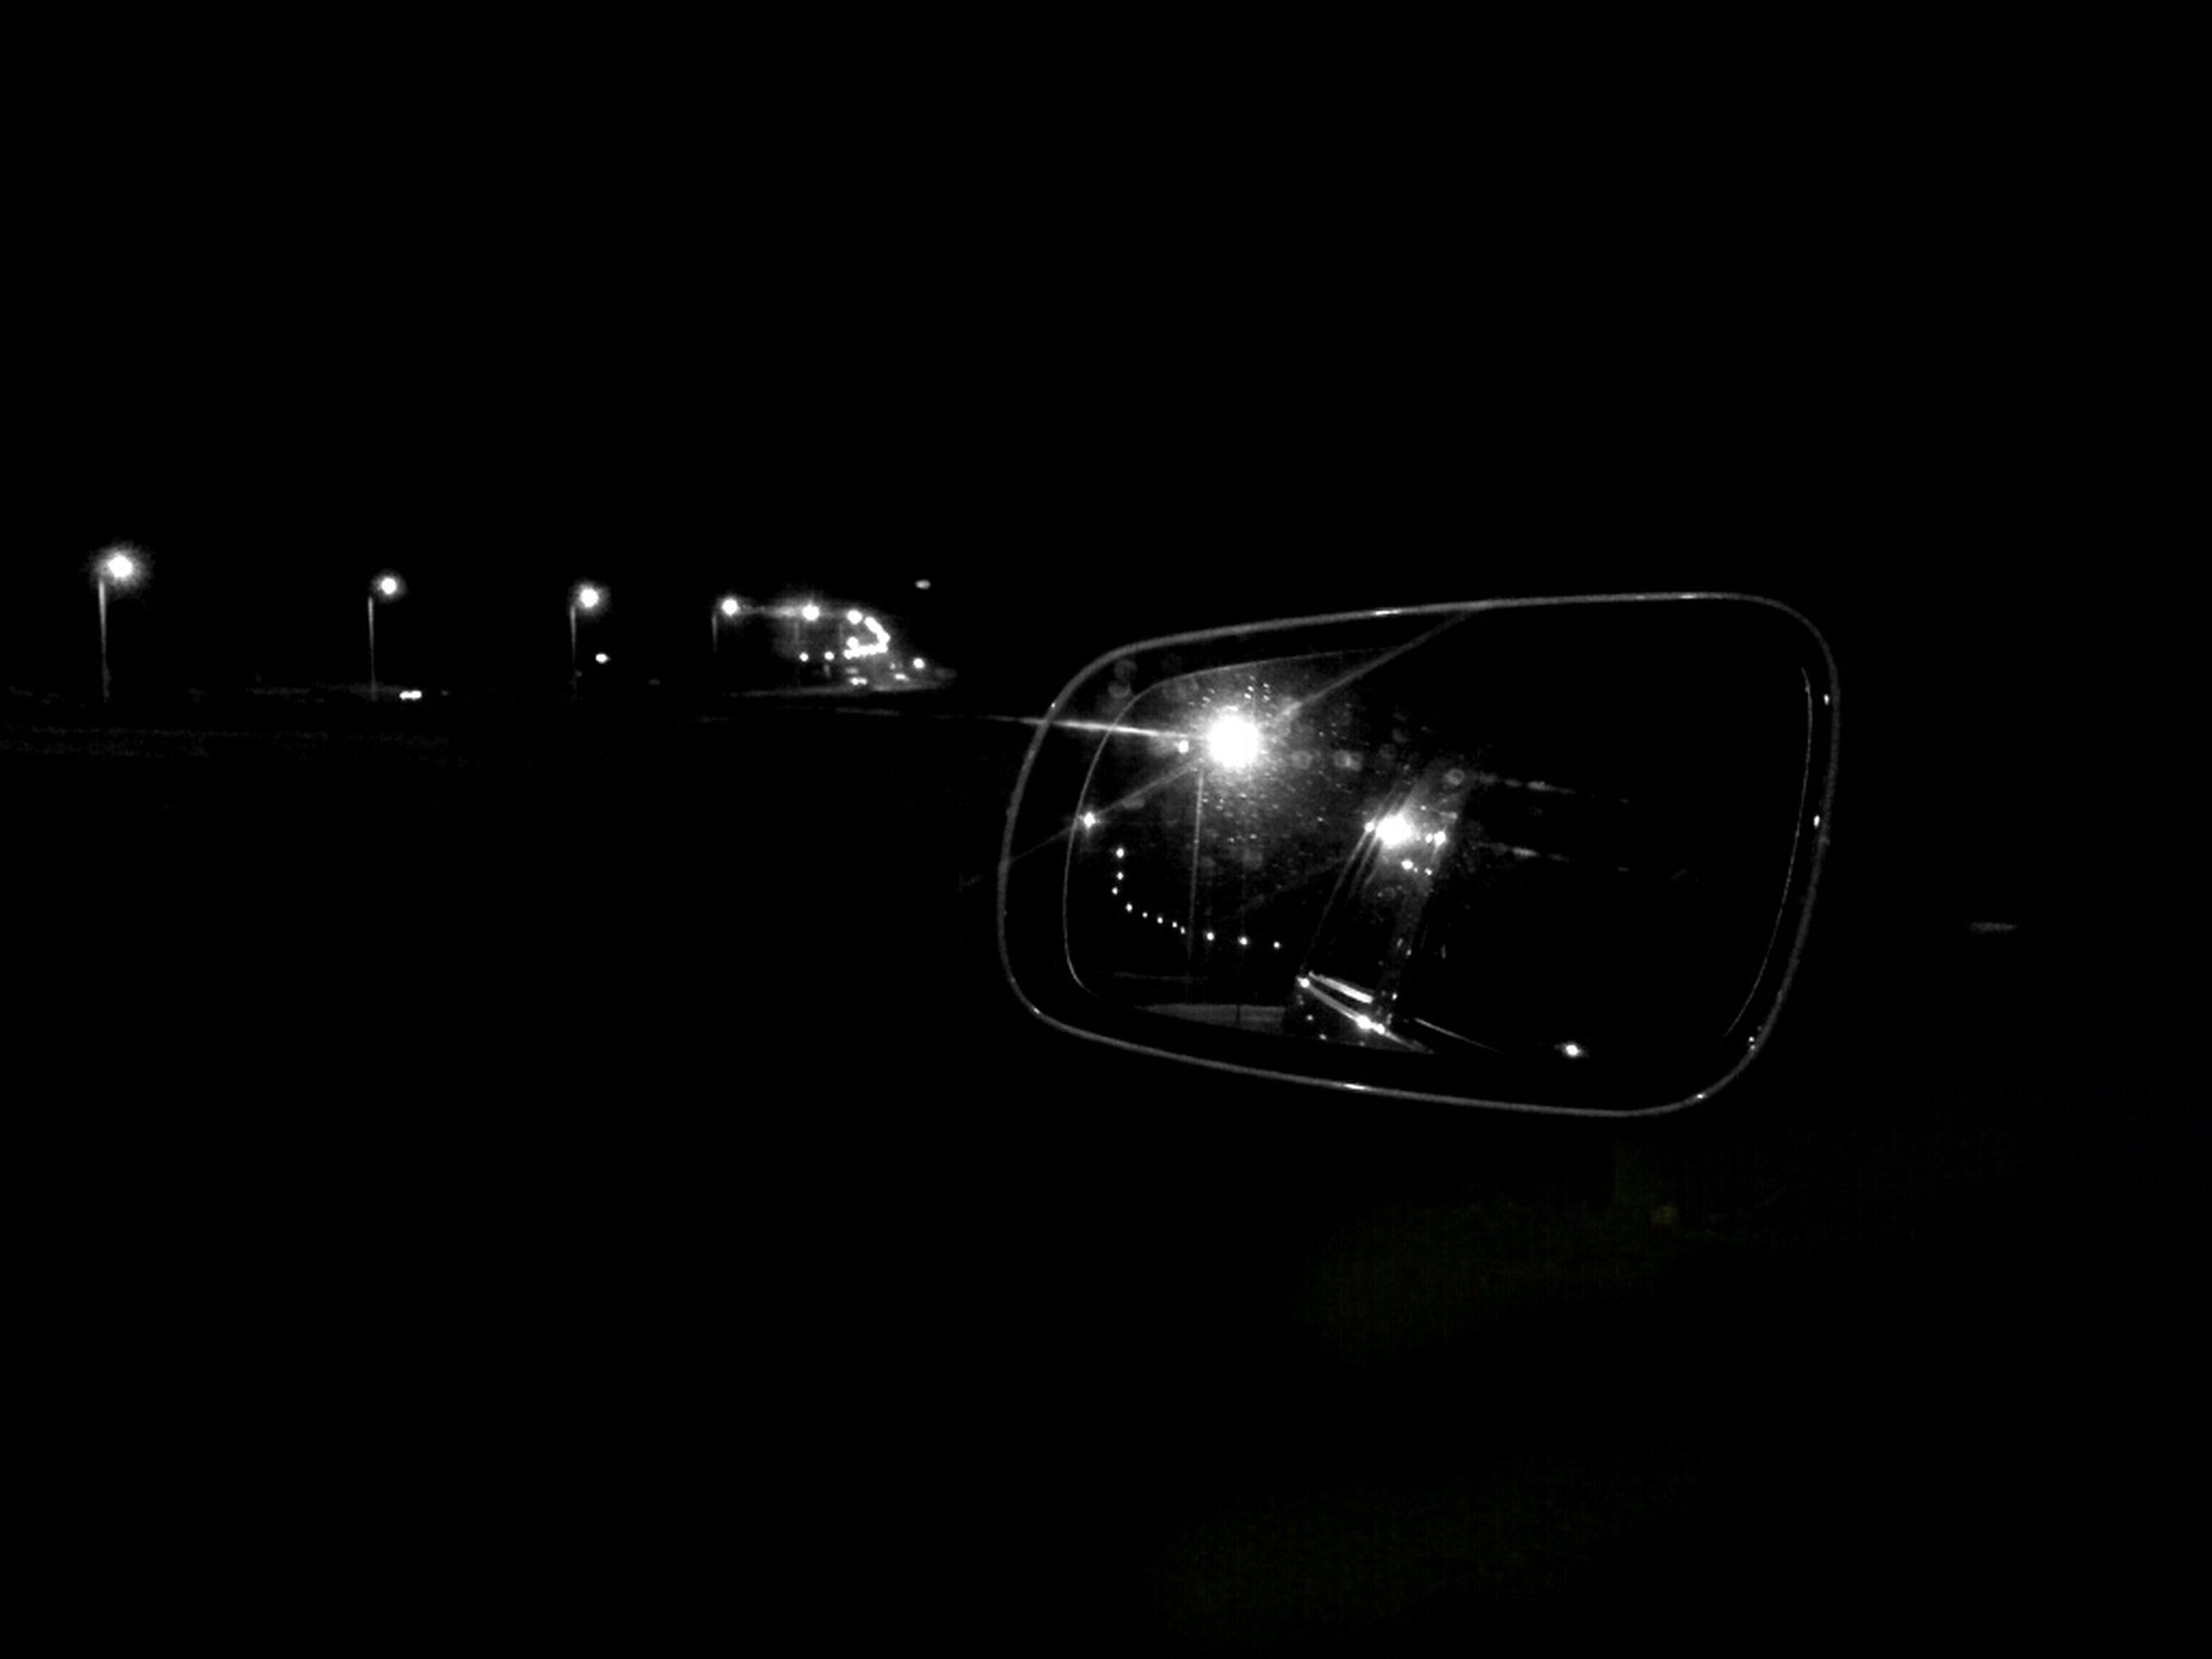 copy space, night, illuminated, dark, studio shot, close-up, car, black background, land vehicle, transportation, reflection, indoors, no people, technology, lighting equipment, retro styled, mode of transport, glowing, light - natural phenomenon, old-fashioned